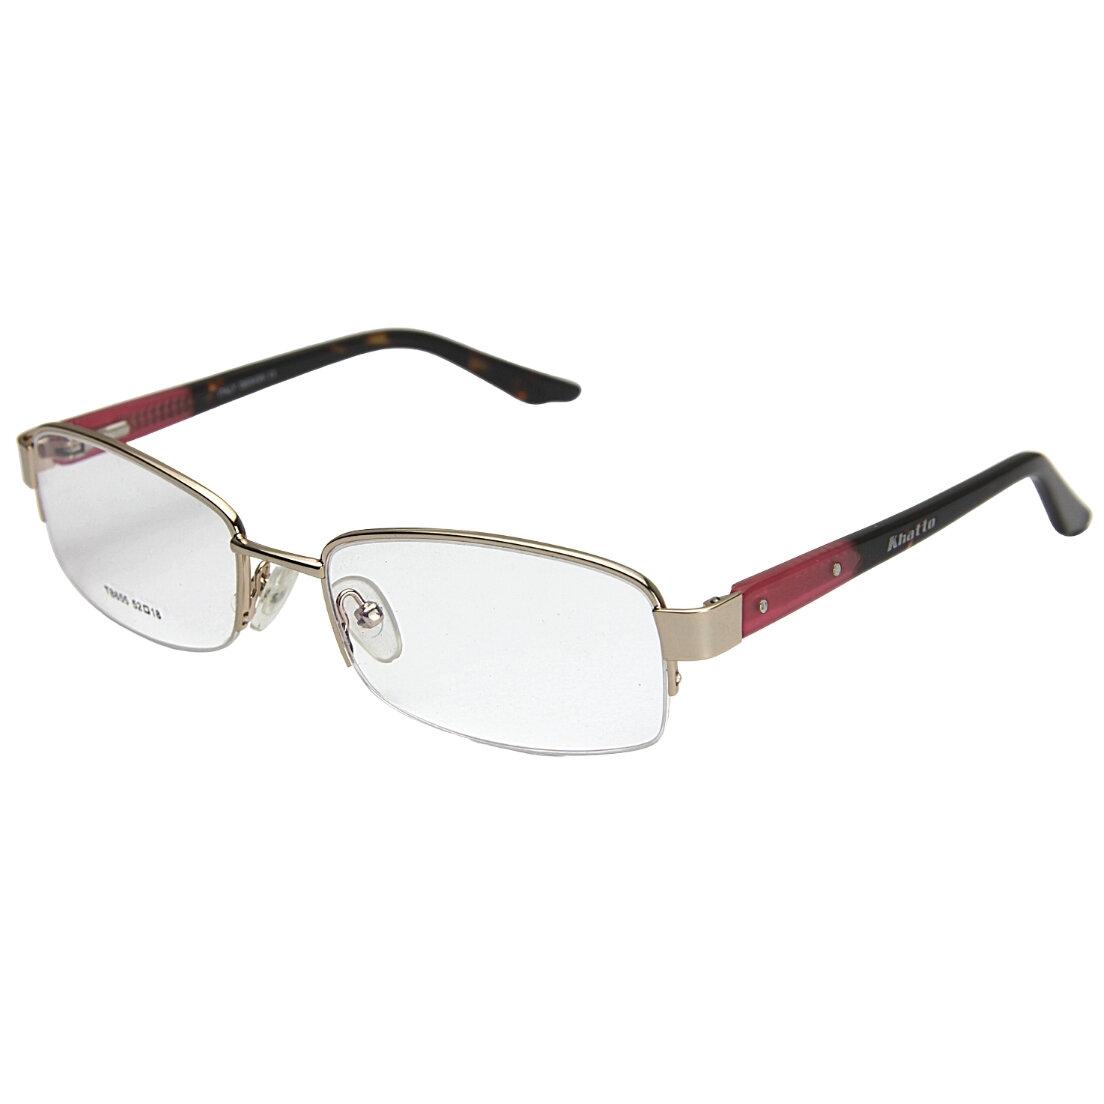 Armação de Óculos Khatto Fusion Color Italy - C143